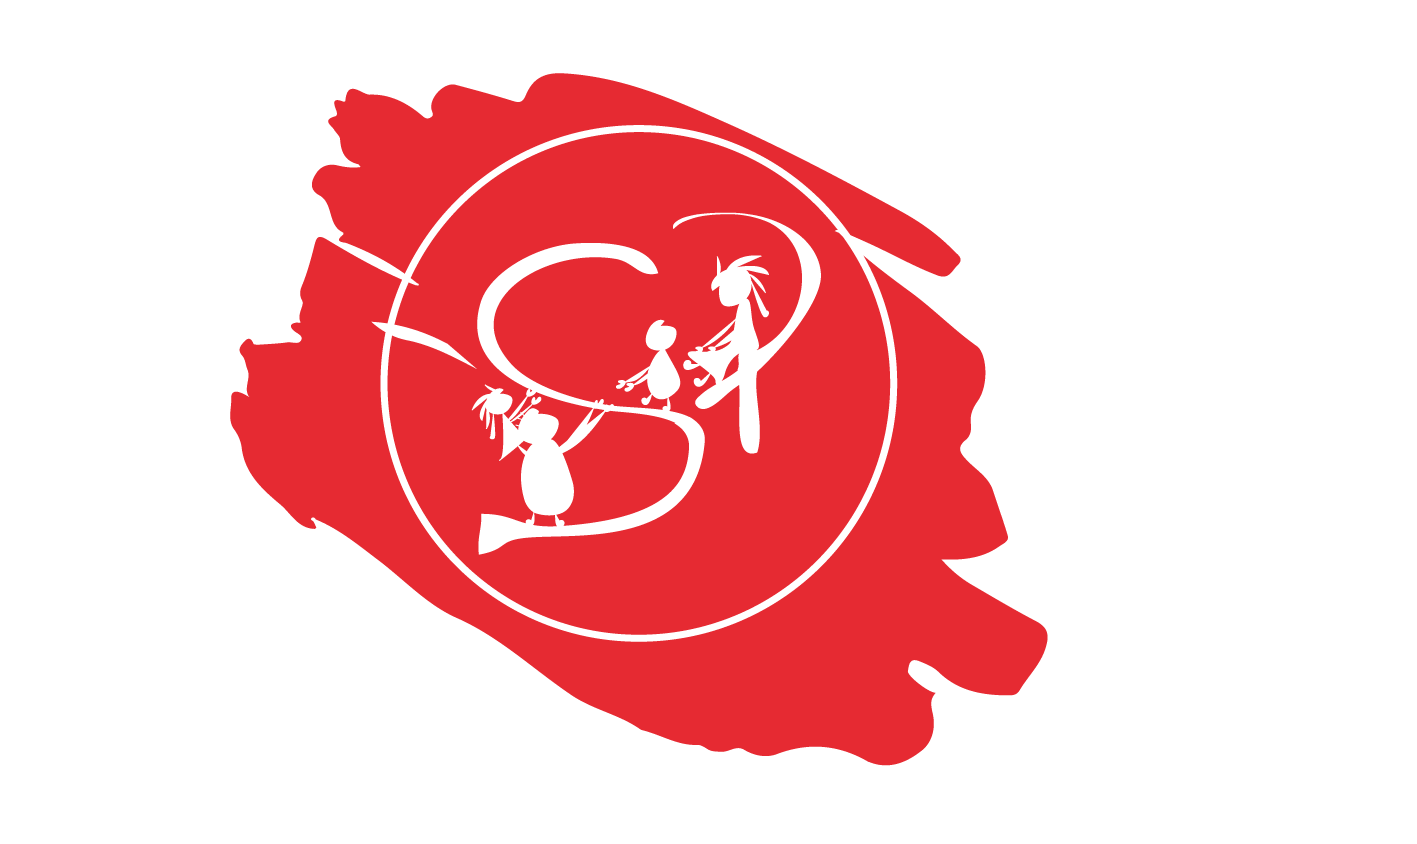 logo-ongd-spinola-solidaria